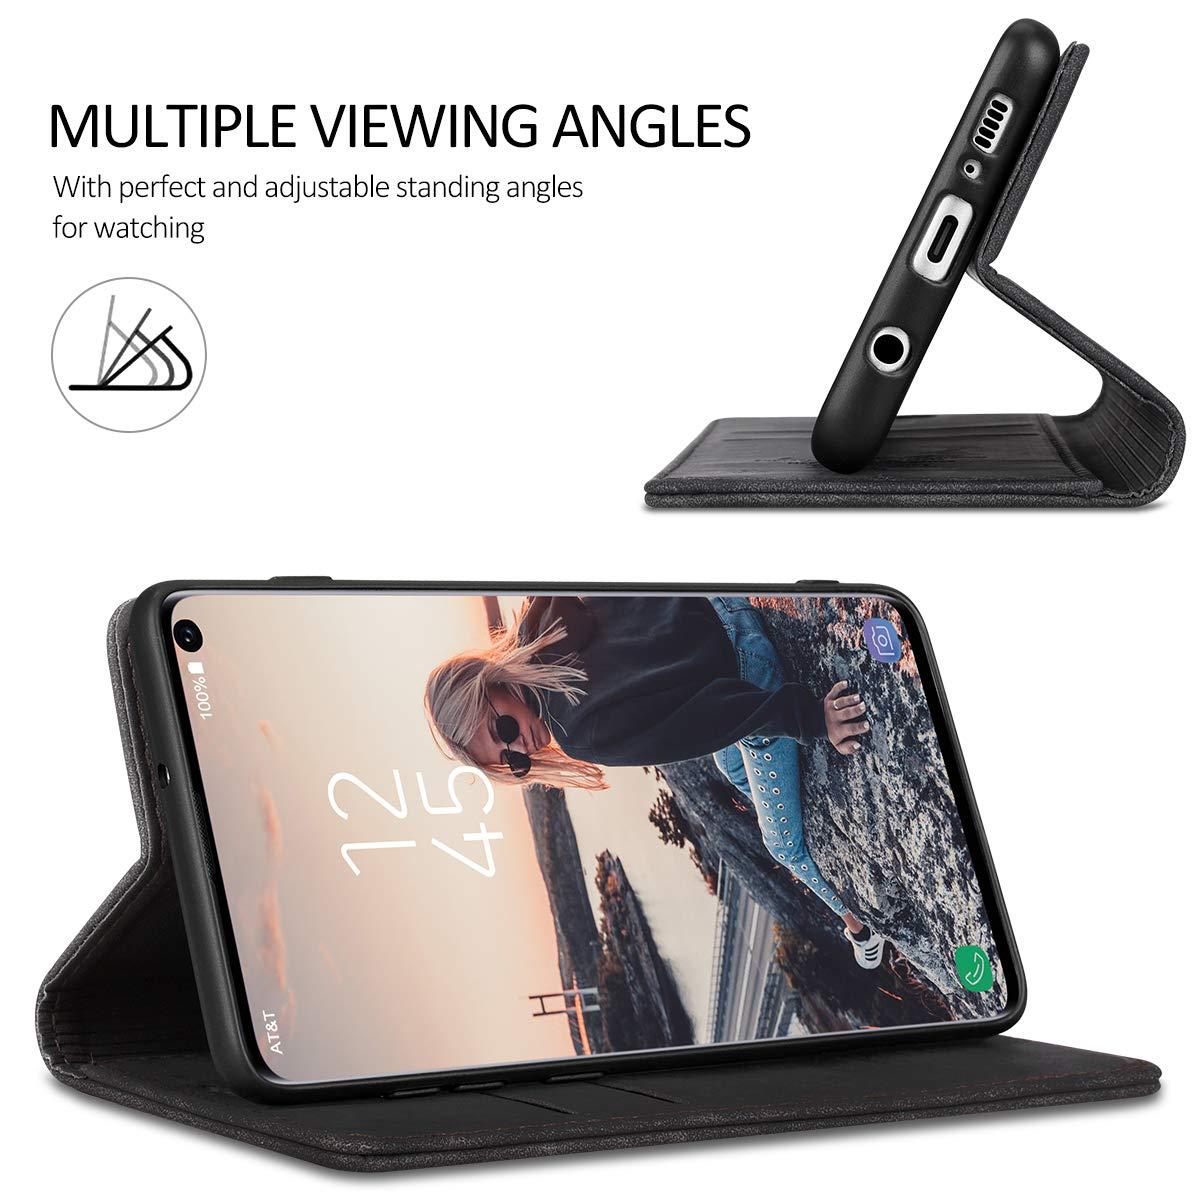 RuiPower para Funda Samsung Galaxy A51 con Tapa Funda Samsung A51 Libro Fundas de Cuero PU Premium Magn/ético Tarjetero y Suporte Silicona Carcasa Samsung A51 Vino Tinto